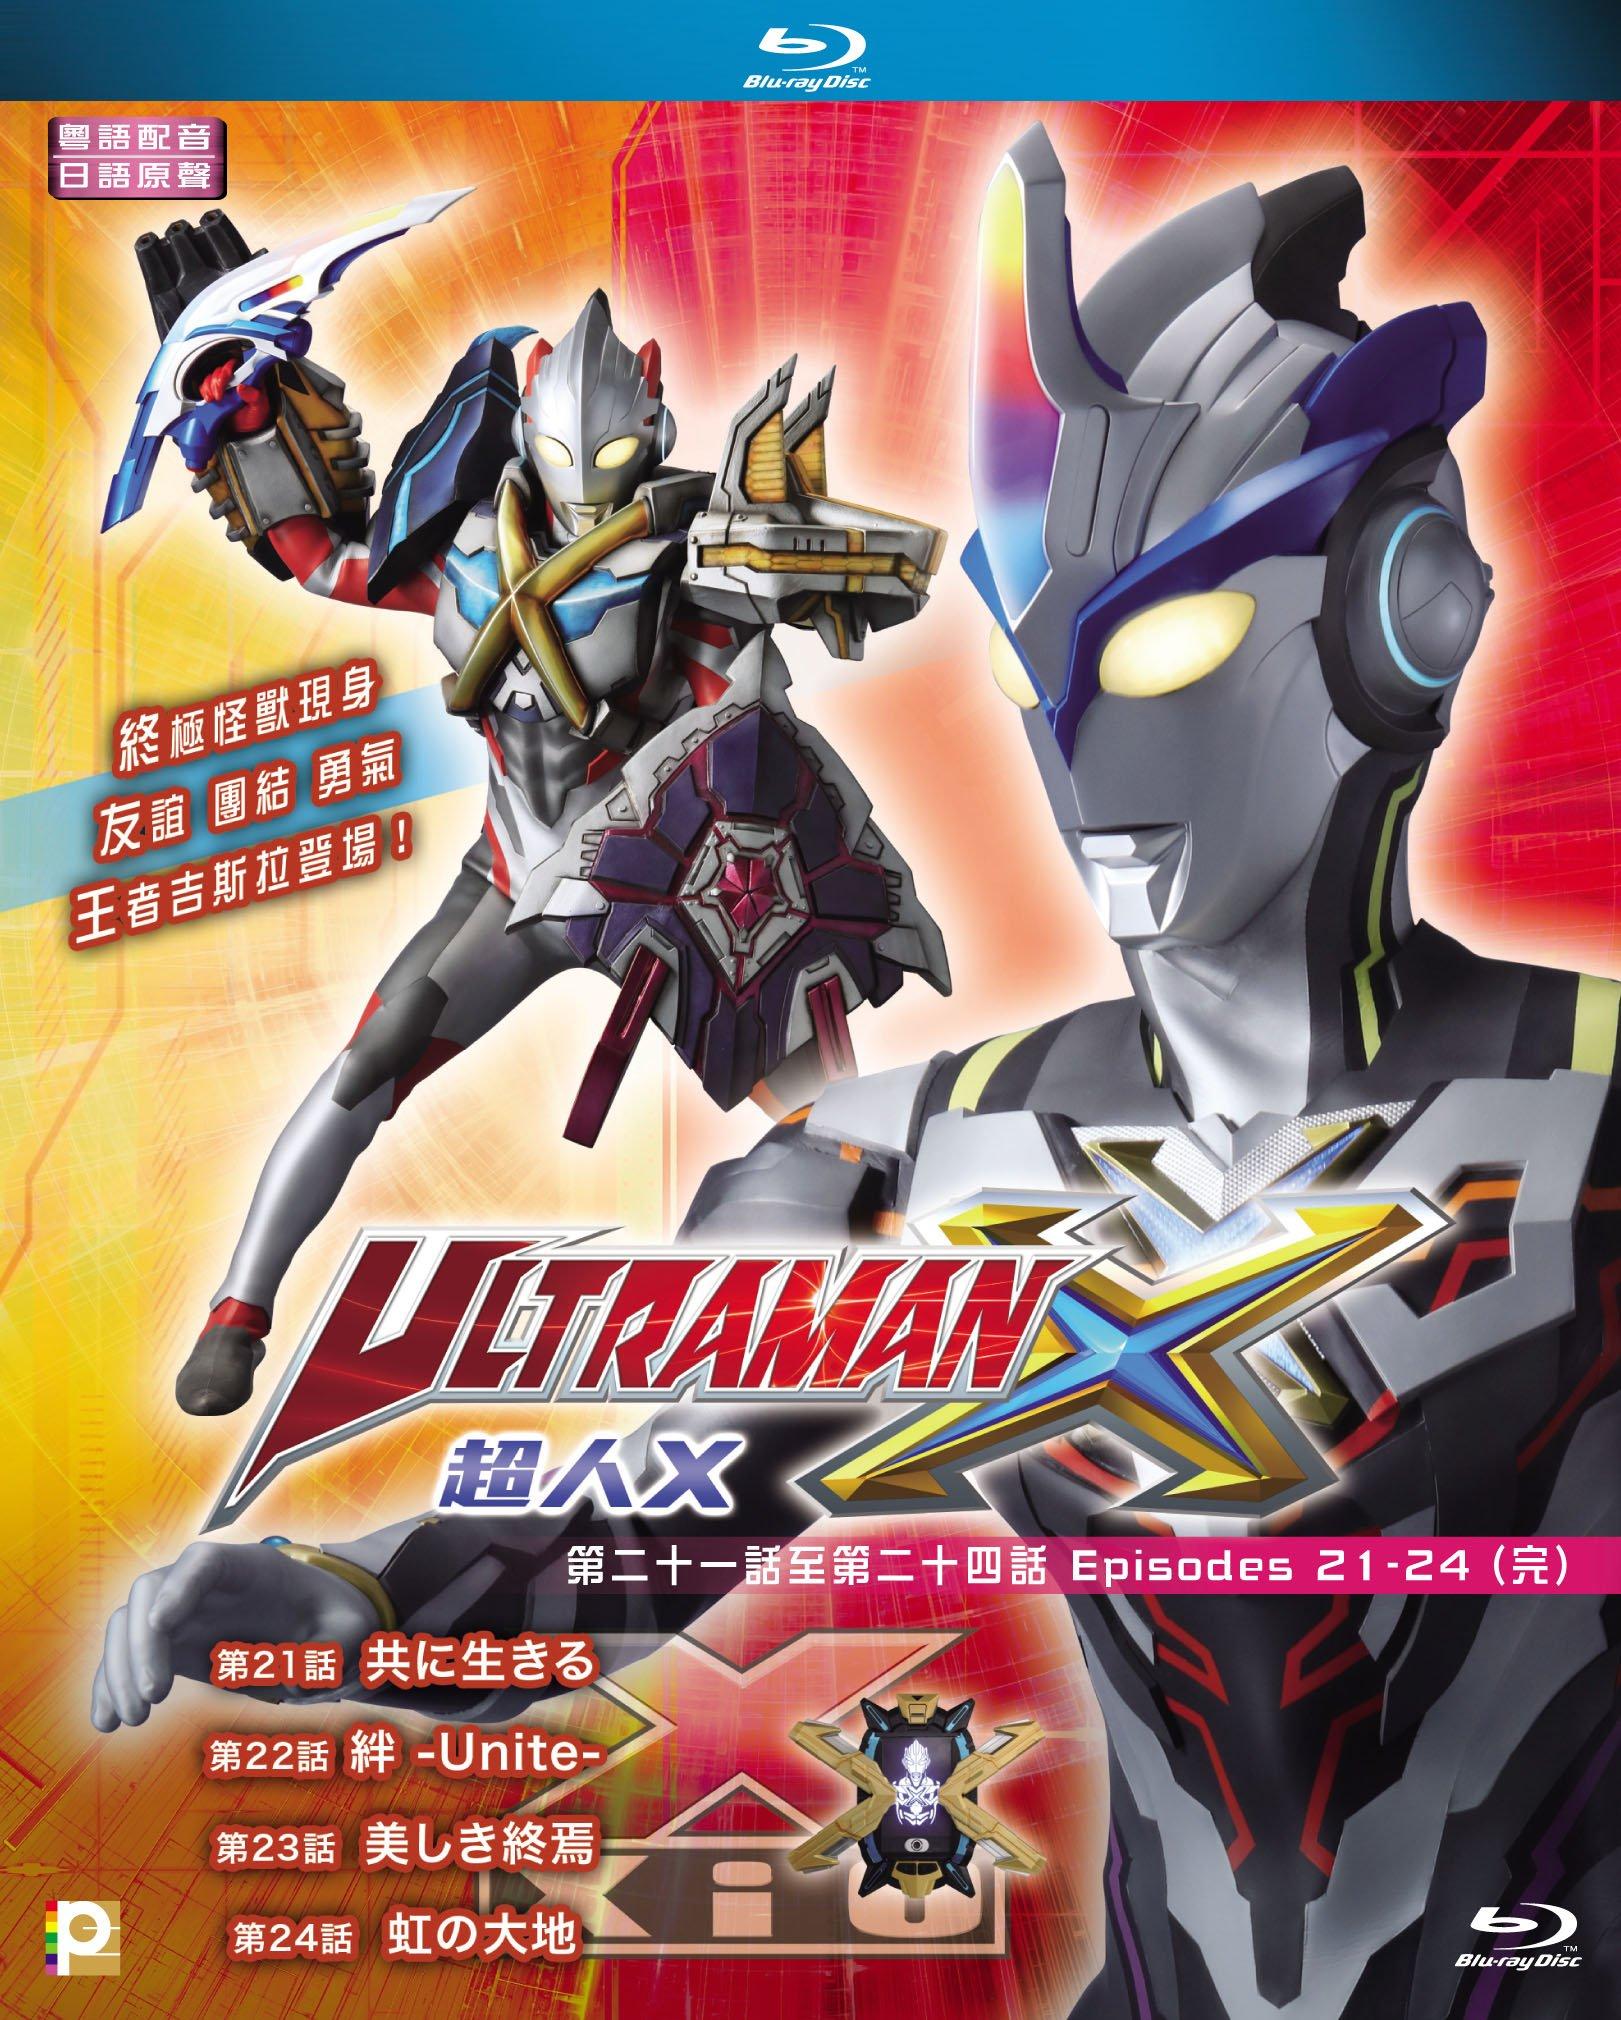 Ultraman X TV Episodes 21-24 (Region A Blu-ray) (English Subtitled) Japanese TV series 超人X電視版第二十一至二十四話